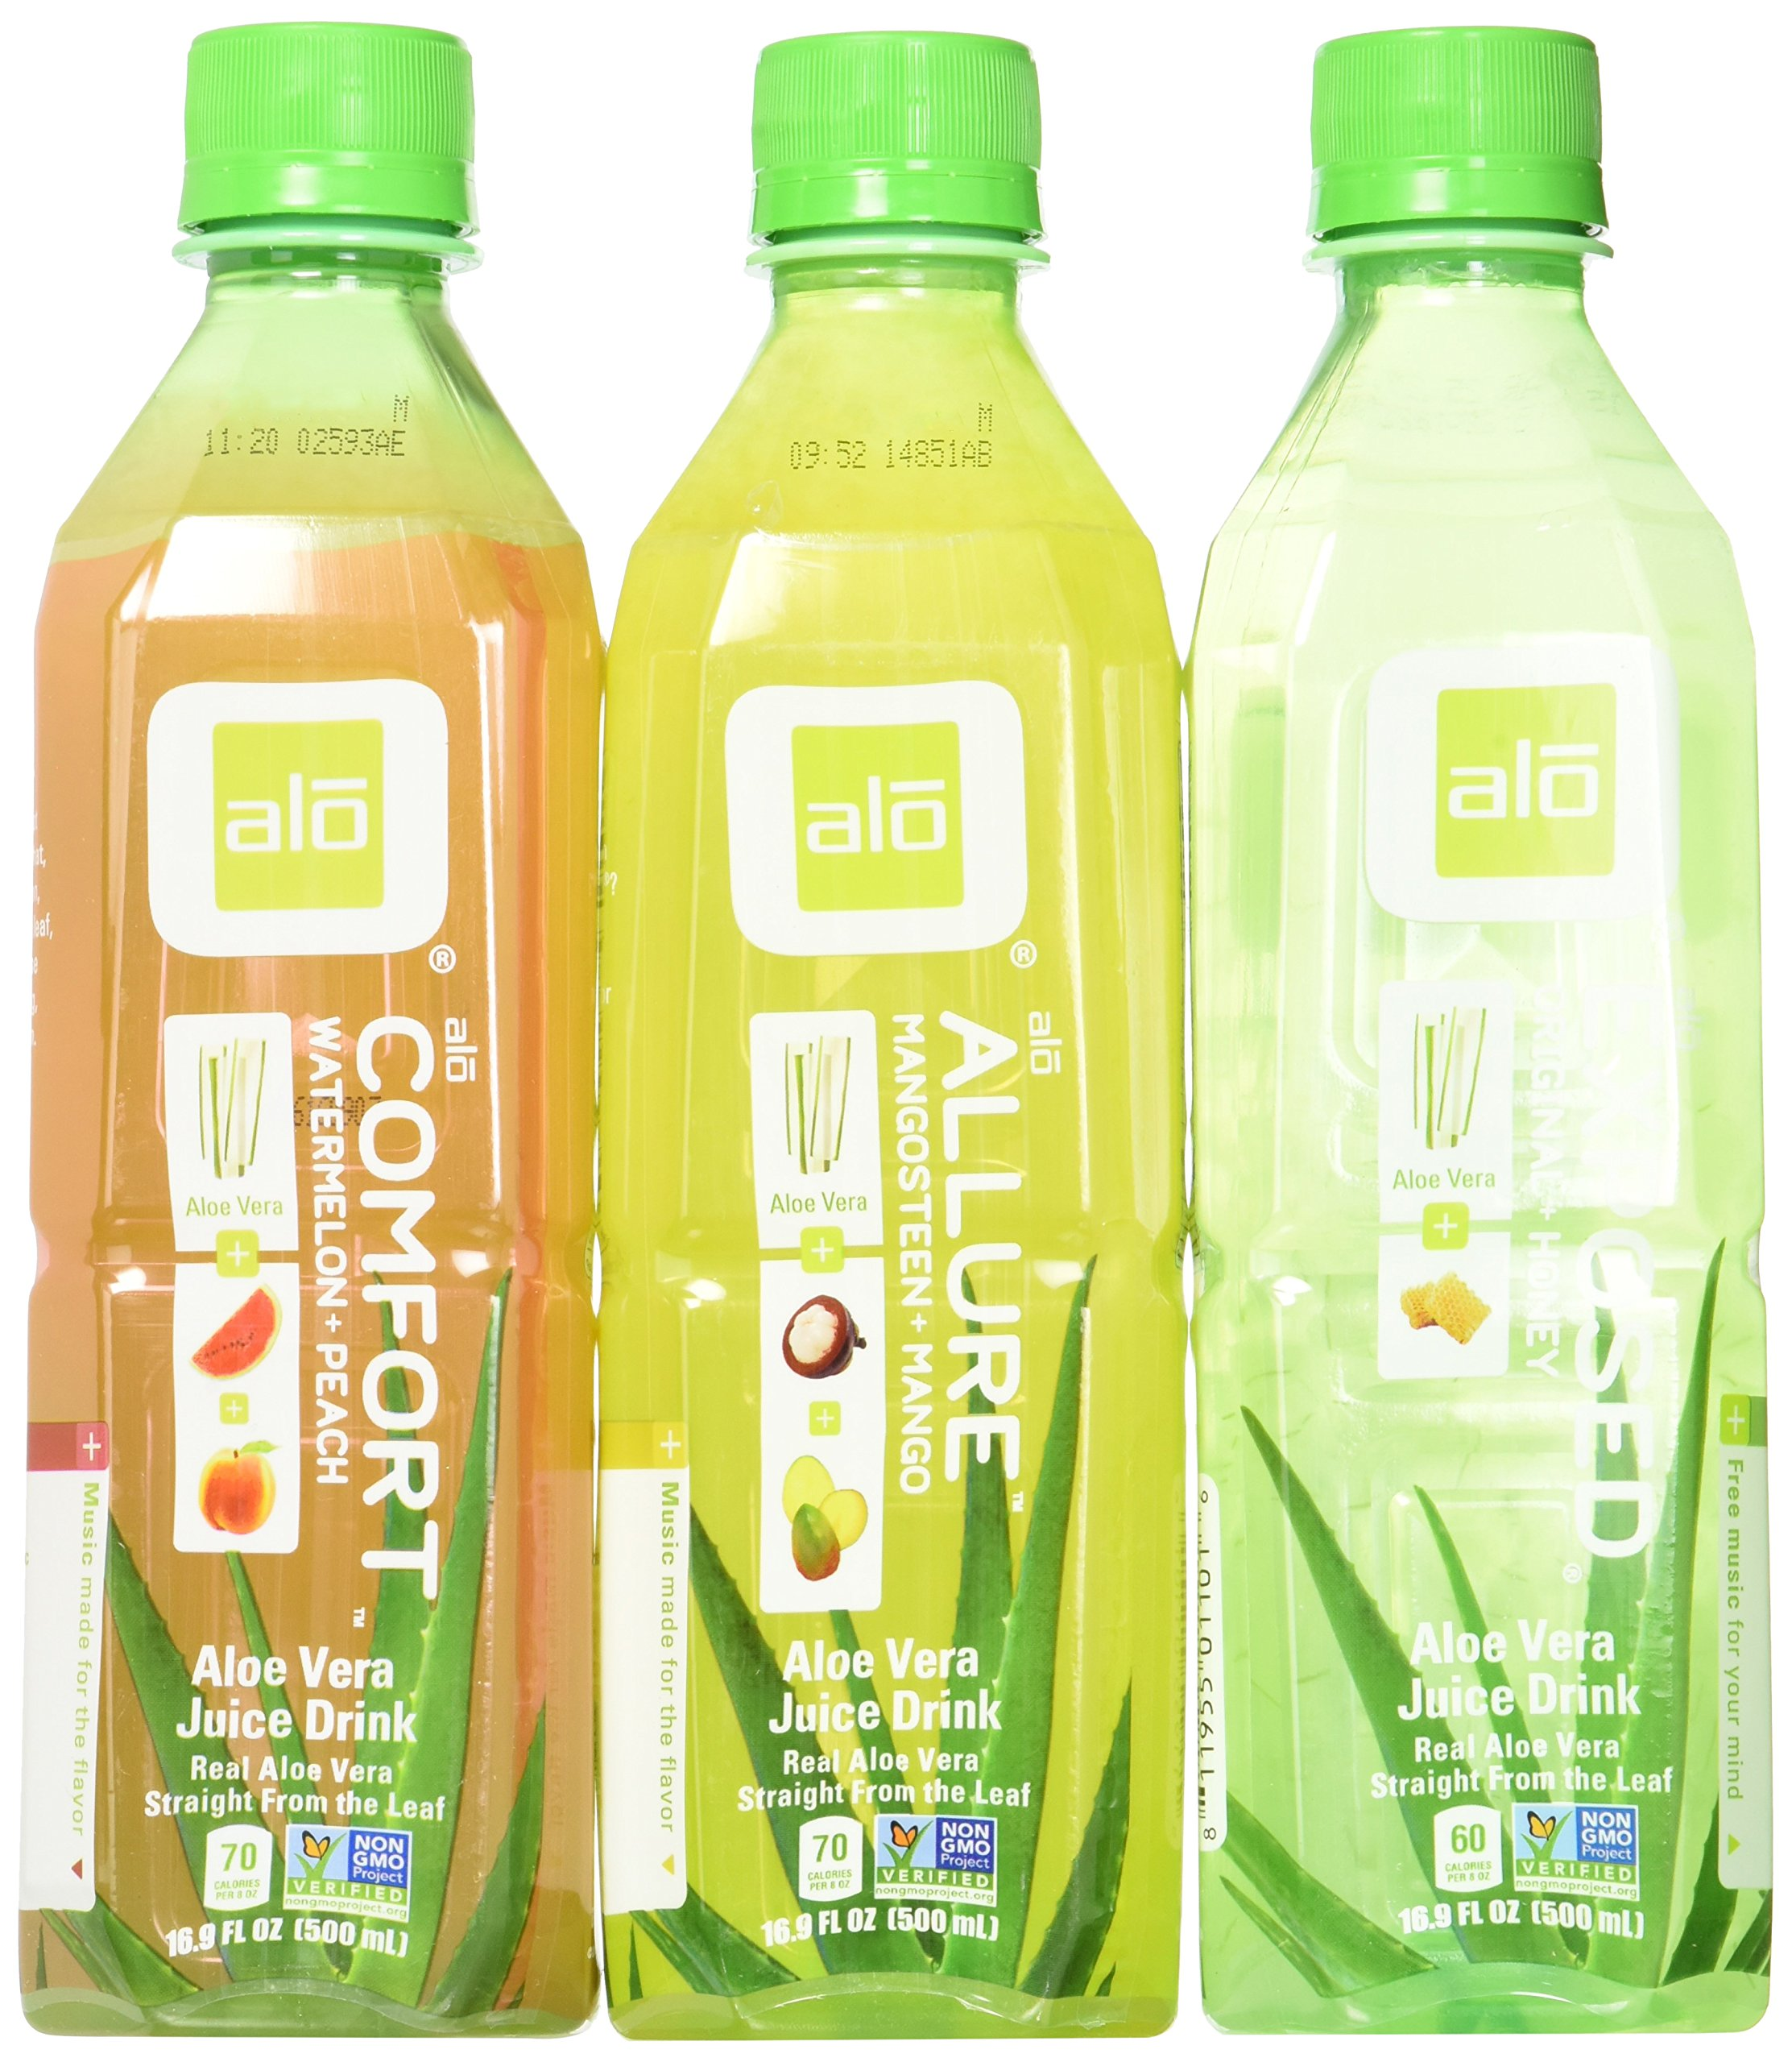 alo Aloe Vera Drink Variety 16.9 oz Bottle (Pack of 12) by ALO (Image #1)